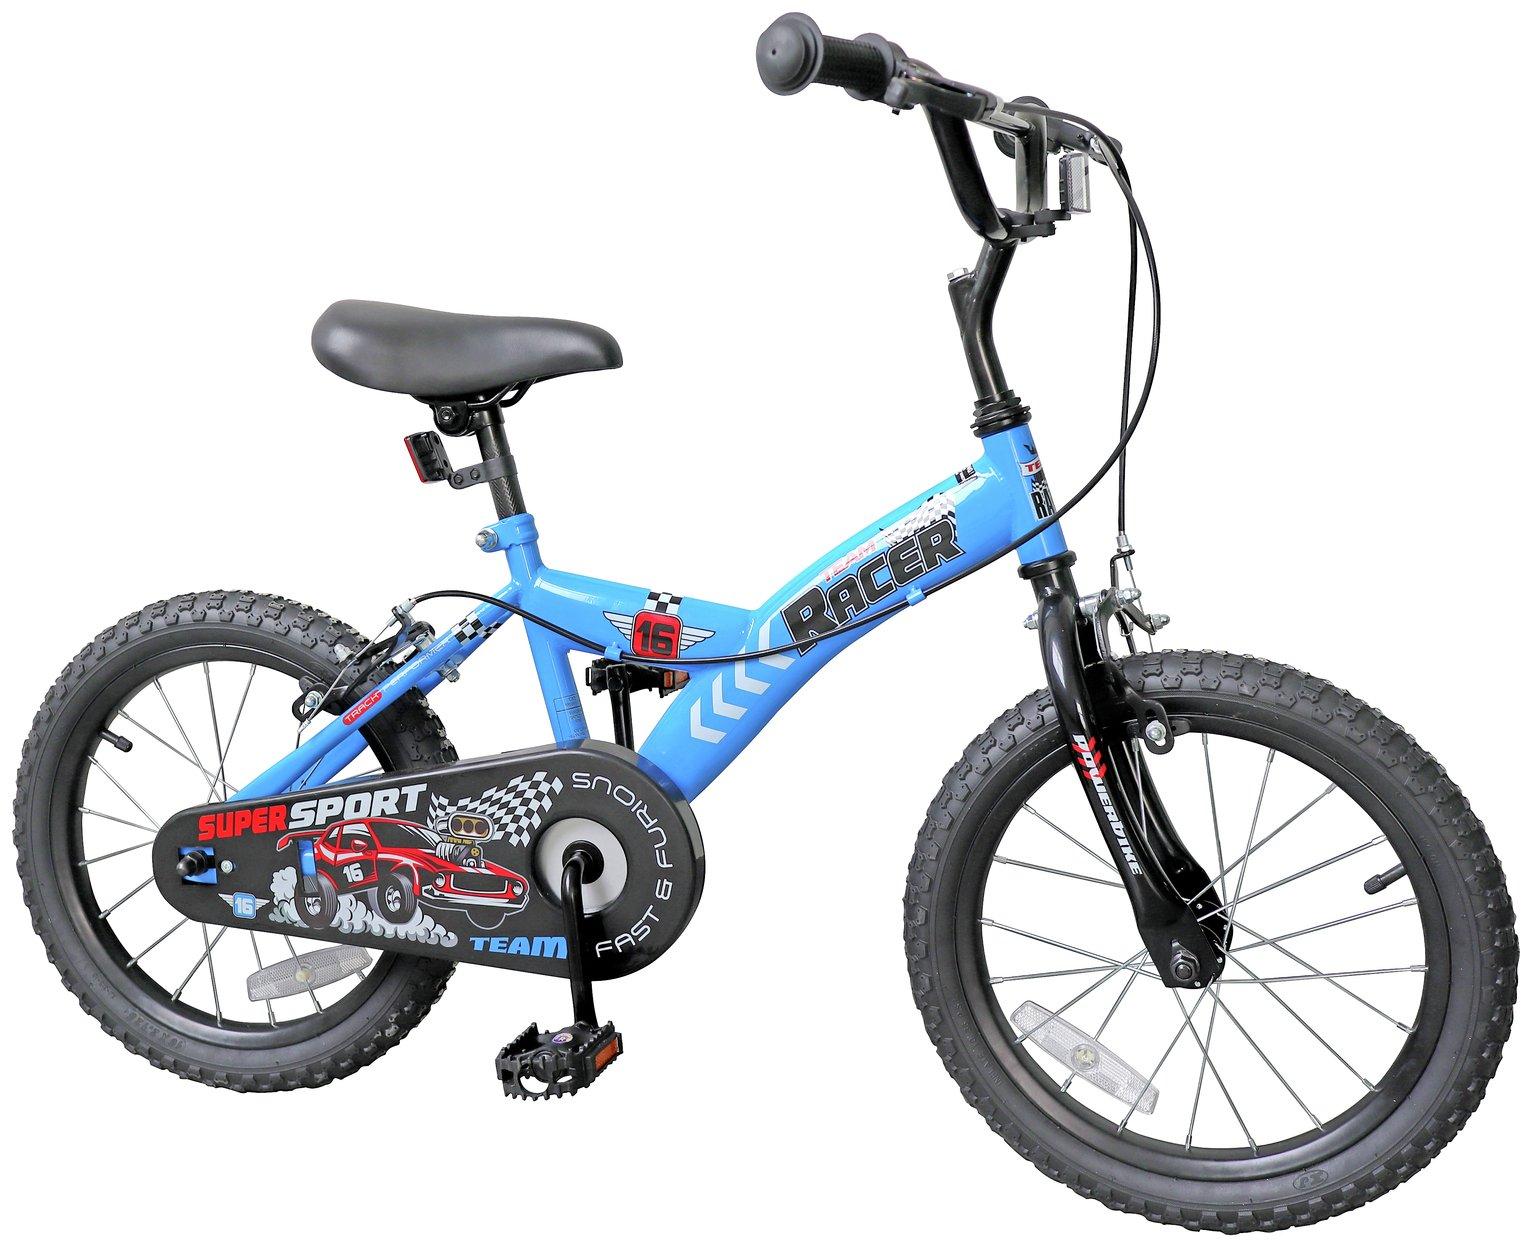 16 Inch Racing Cars Kid's Bike